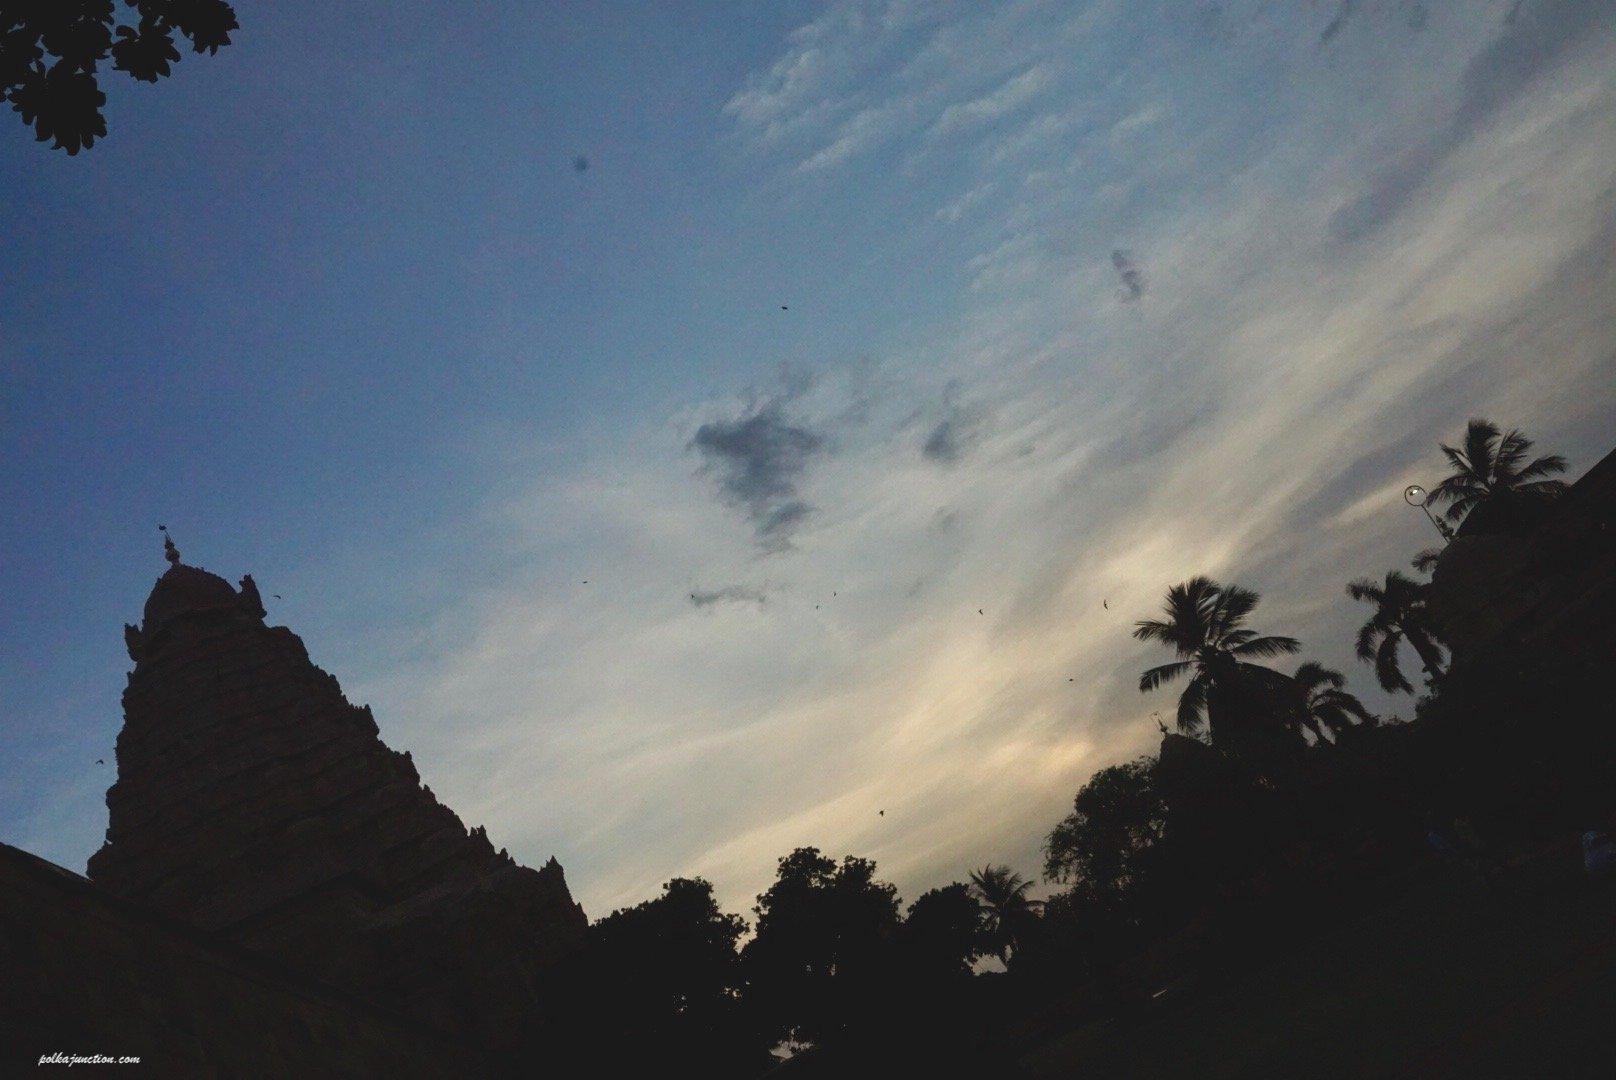 sunset at Brihadeeswarar temple at Gangaikondacholapuram